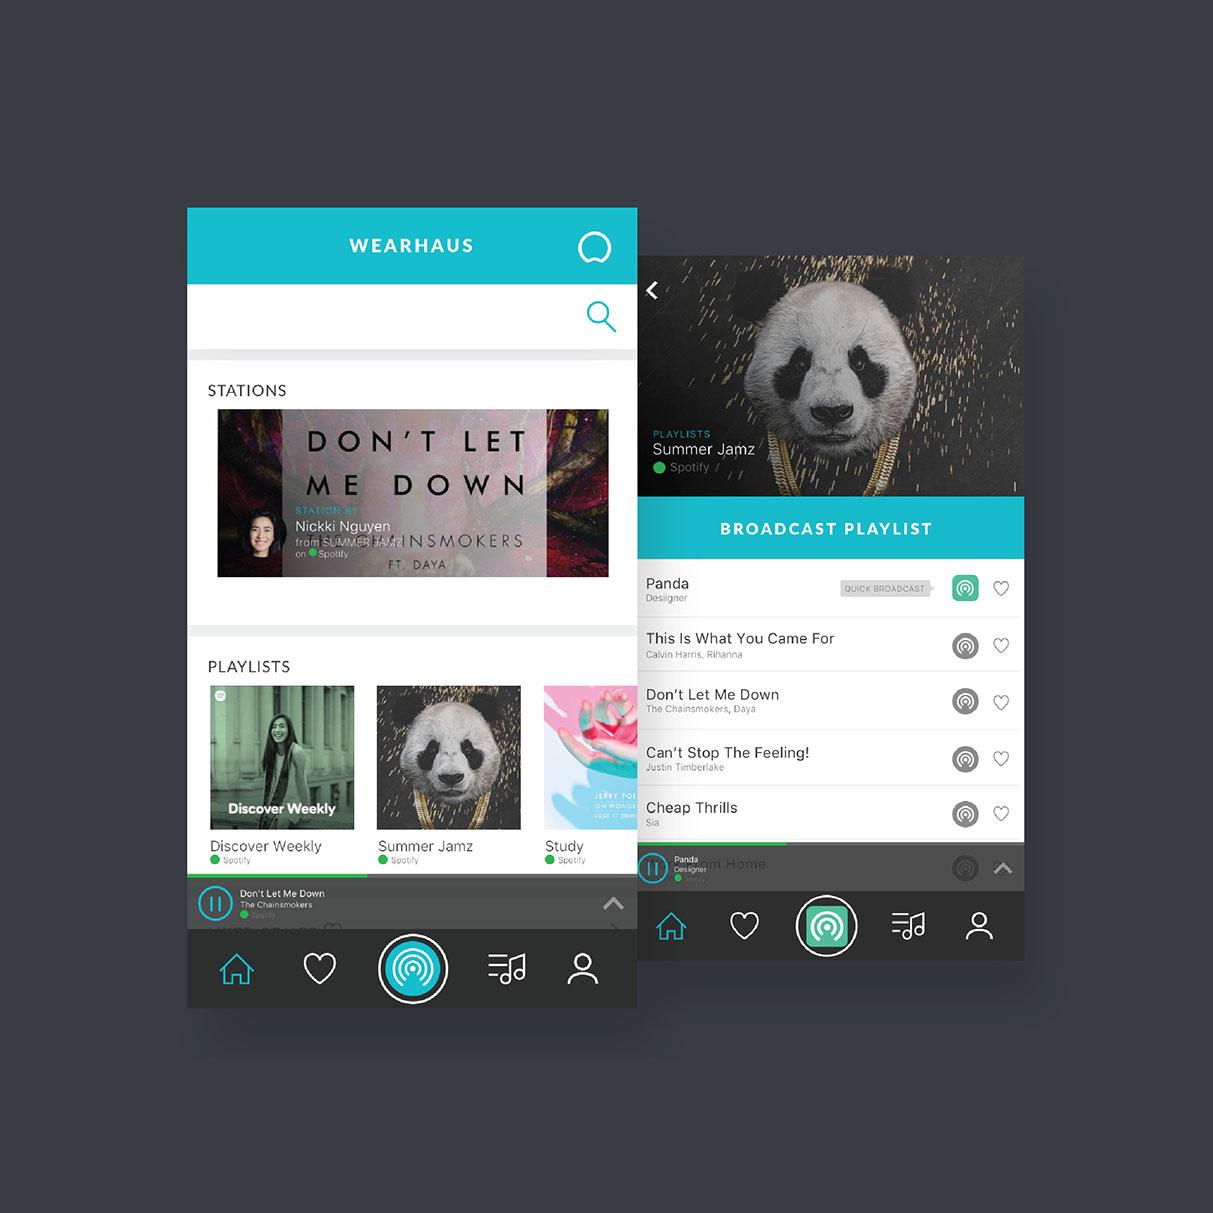 Wearhaus mobile app, ui/ux design & branding